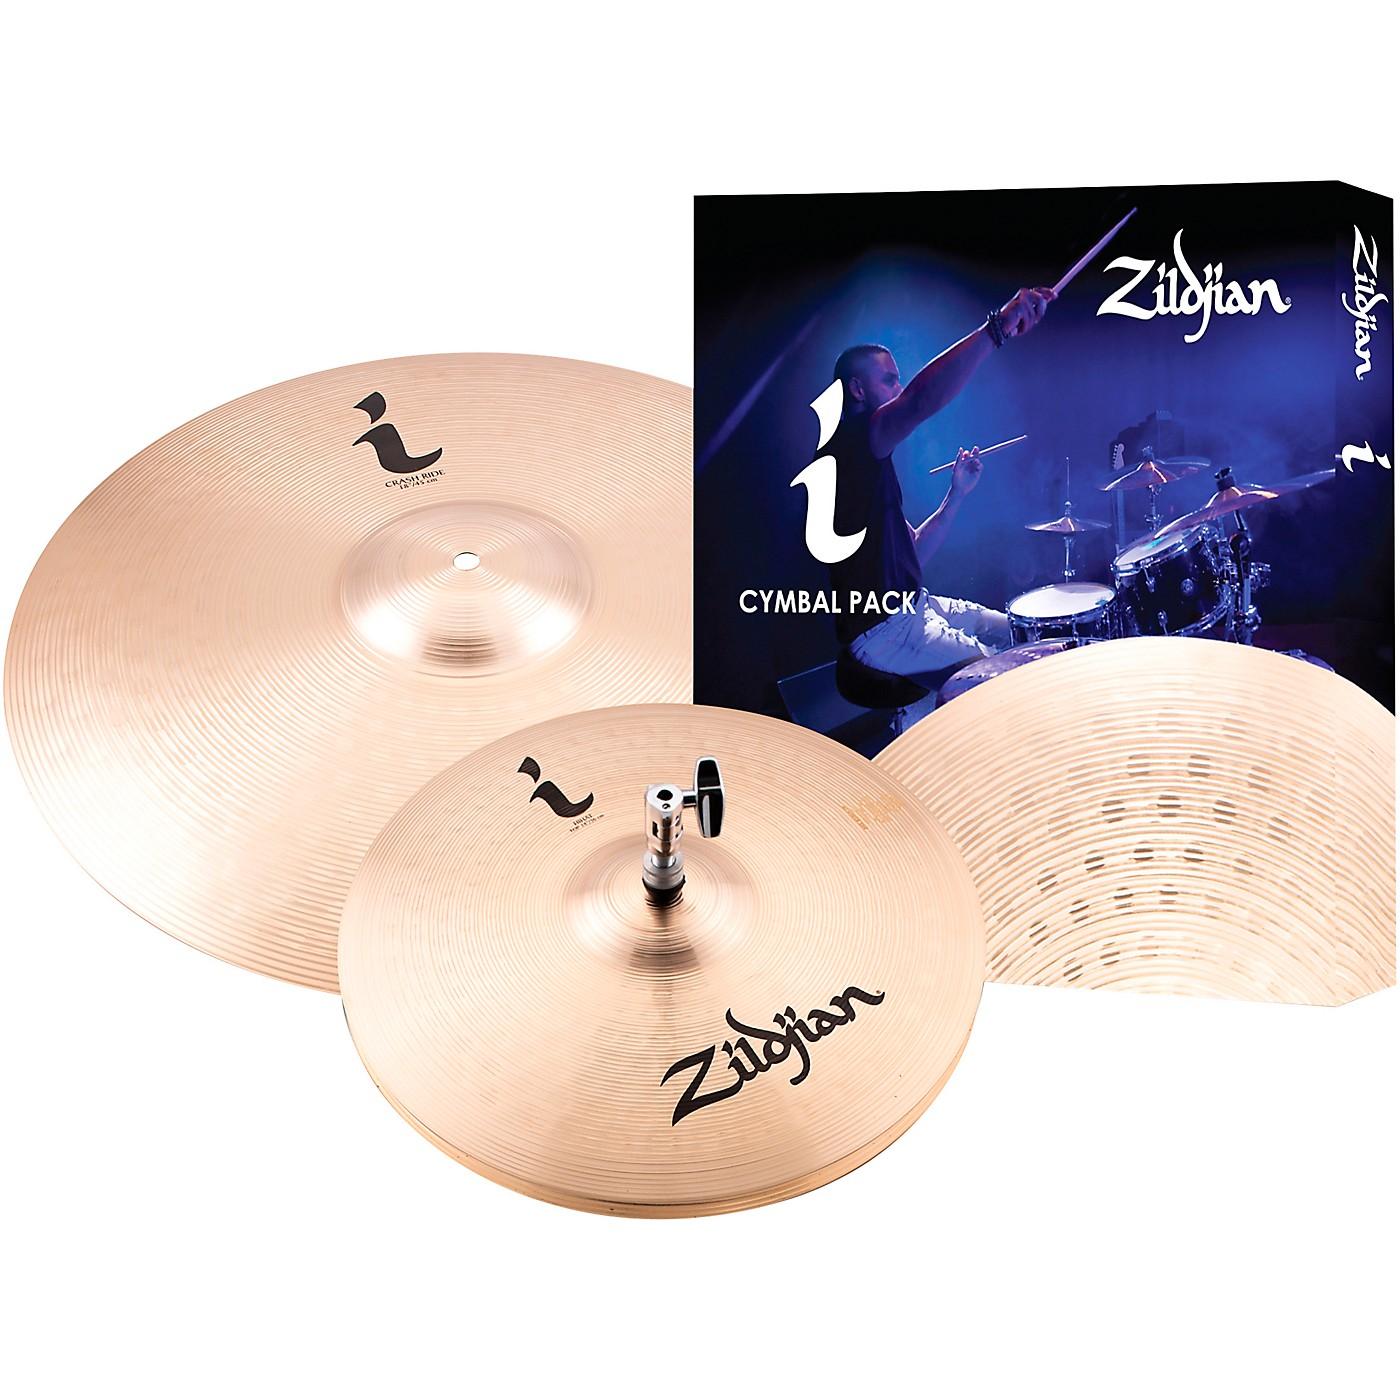 Zildjian I Series Cymbal Pack thumbnail